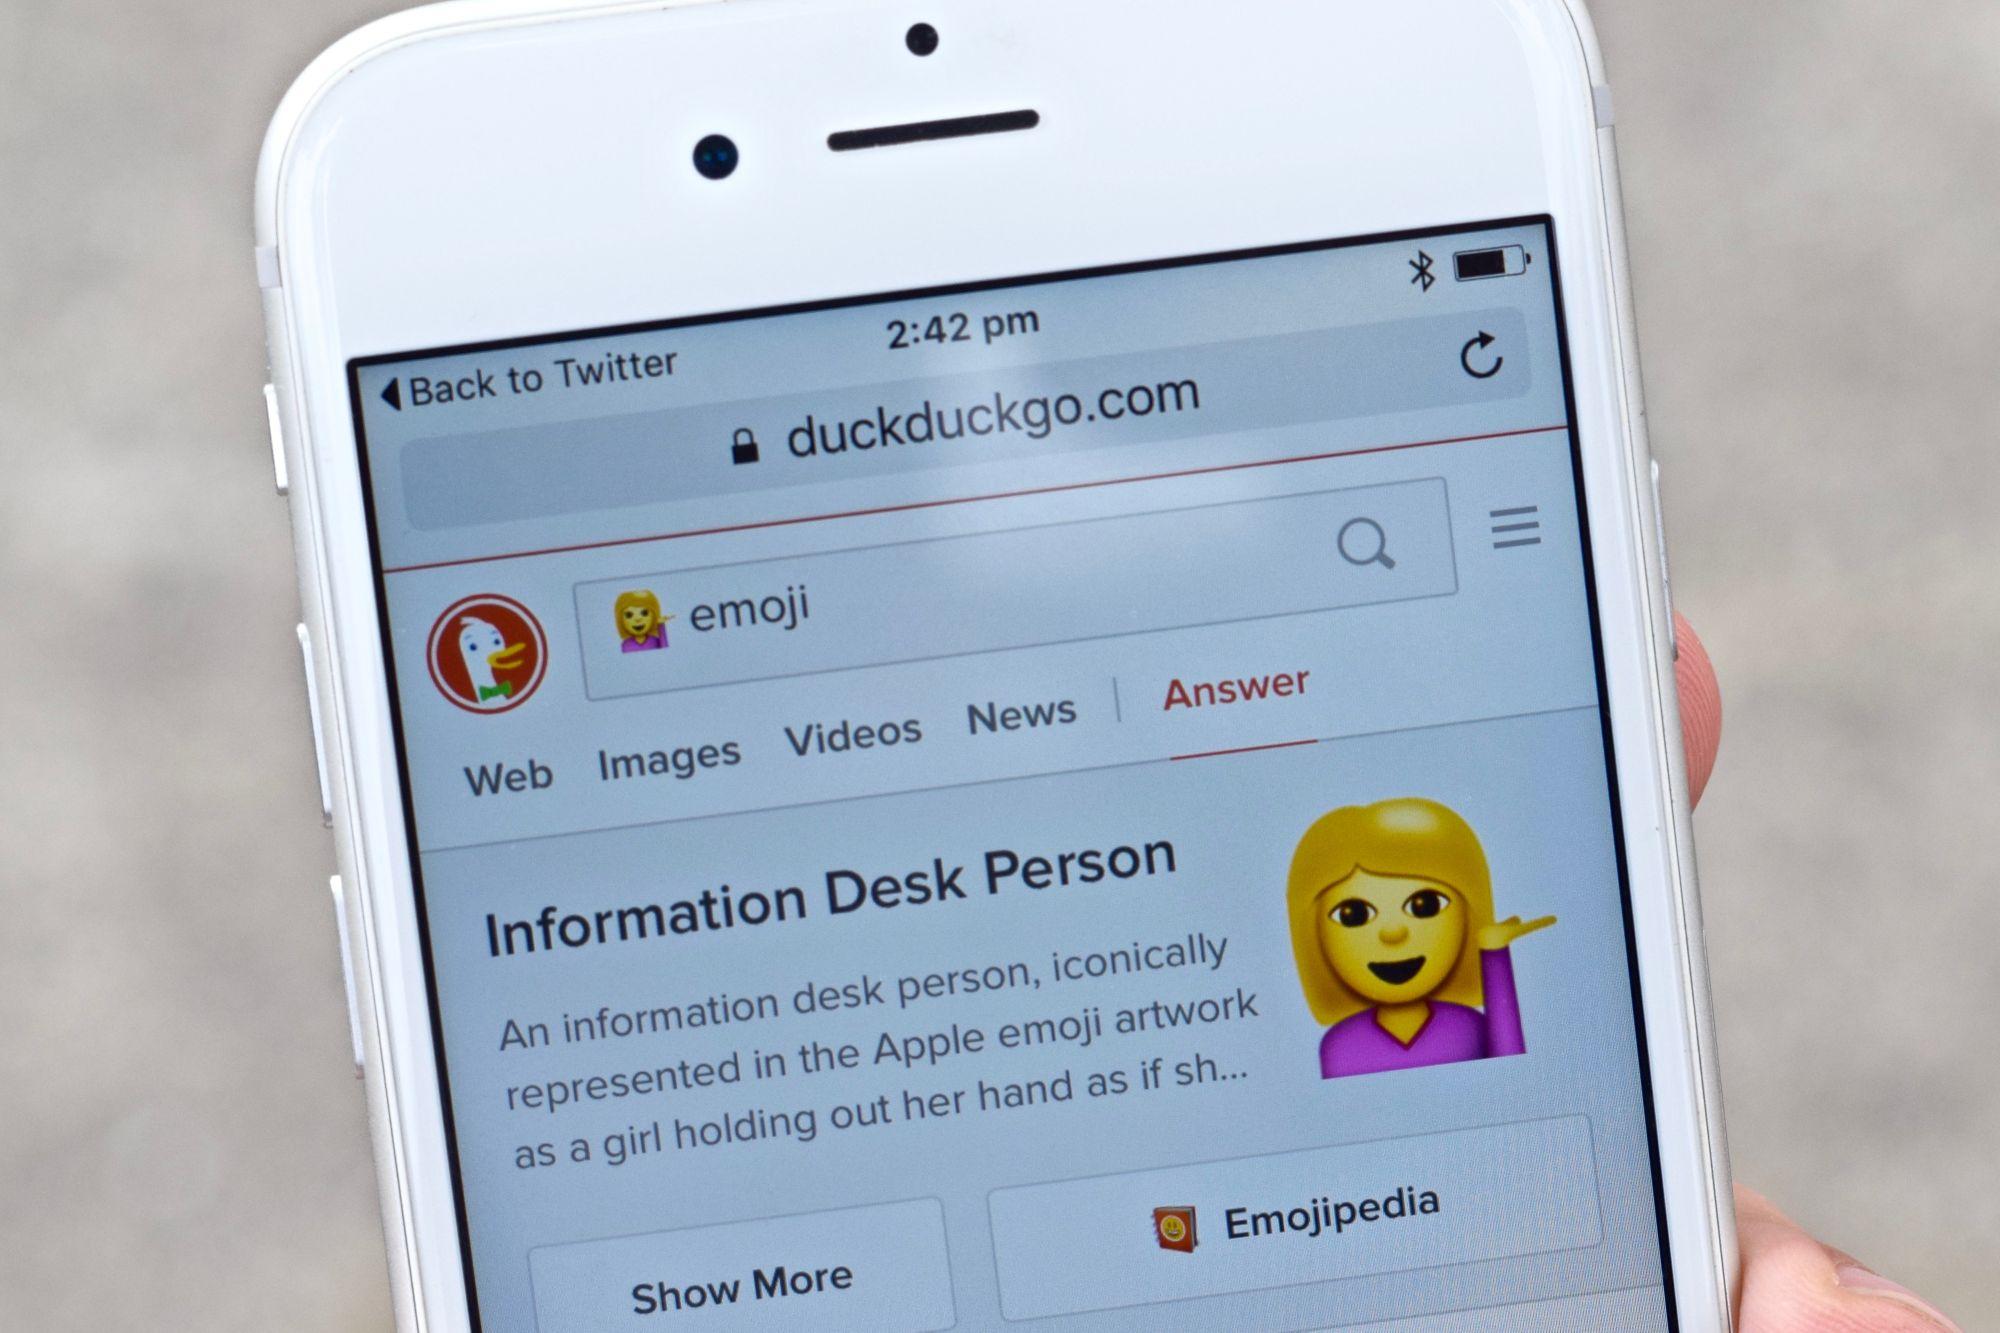 Emojipedia and DuckDuckGo